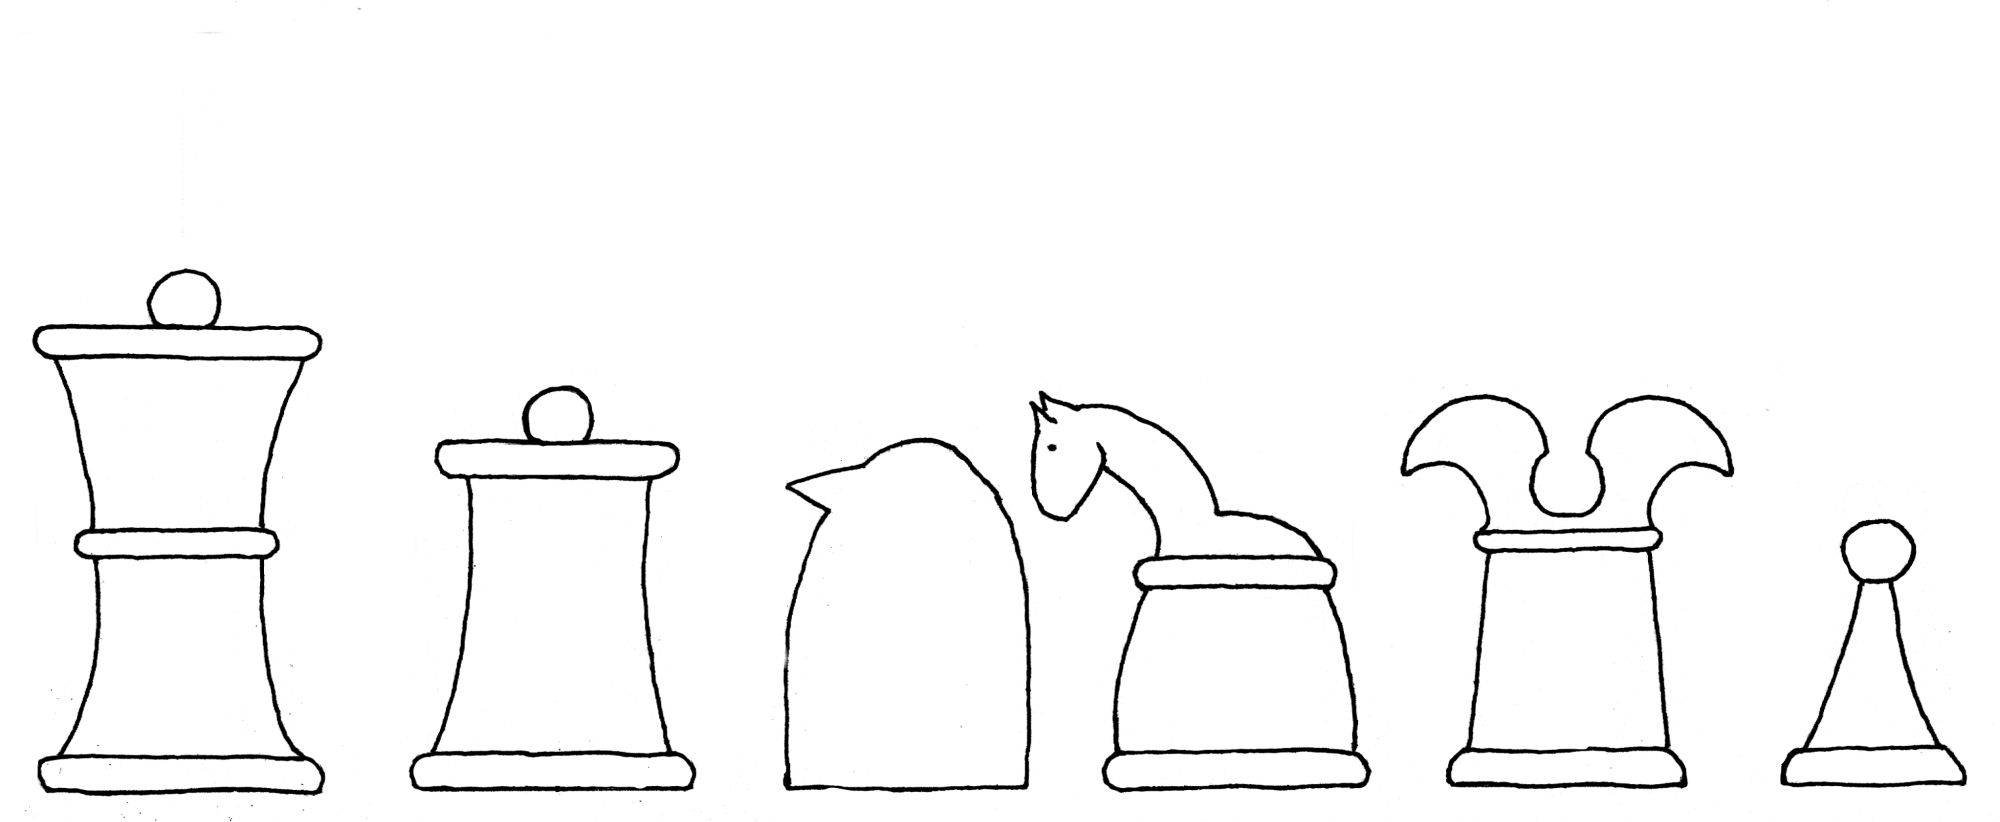 Alfonso chess set interpretive diagram